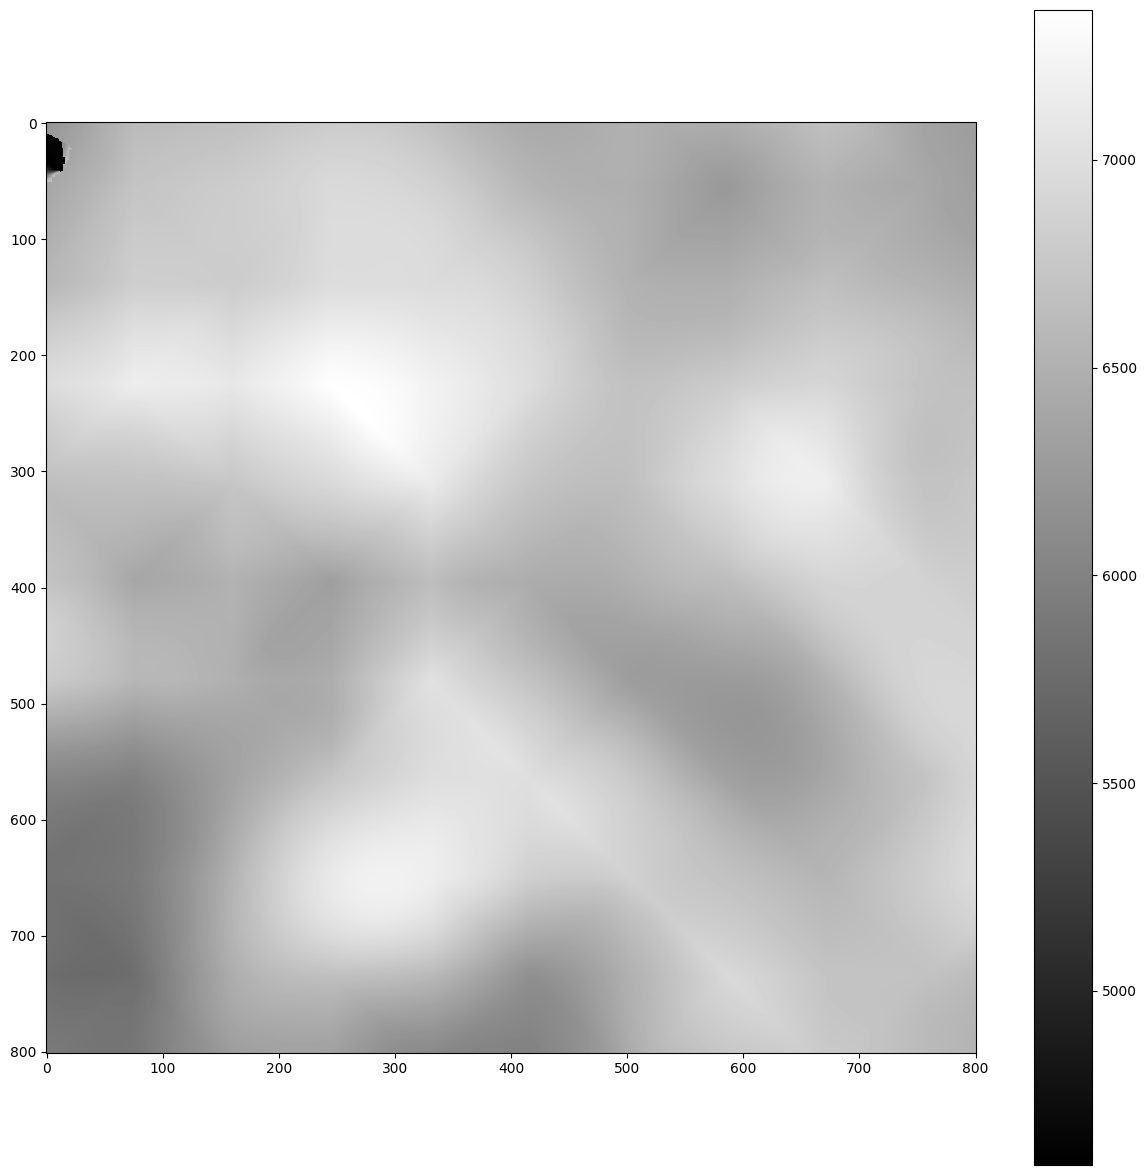 bench/seismic/wp/la_habra/meshes/velocity_model/plots/vp_10000.png